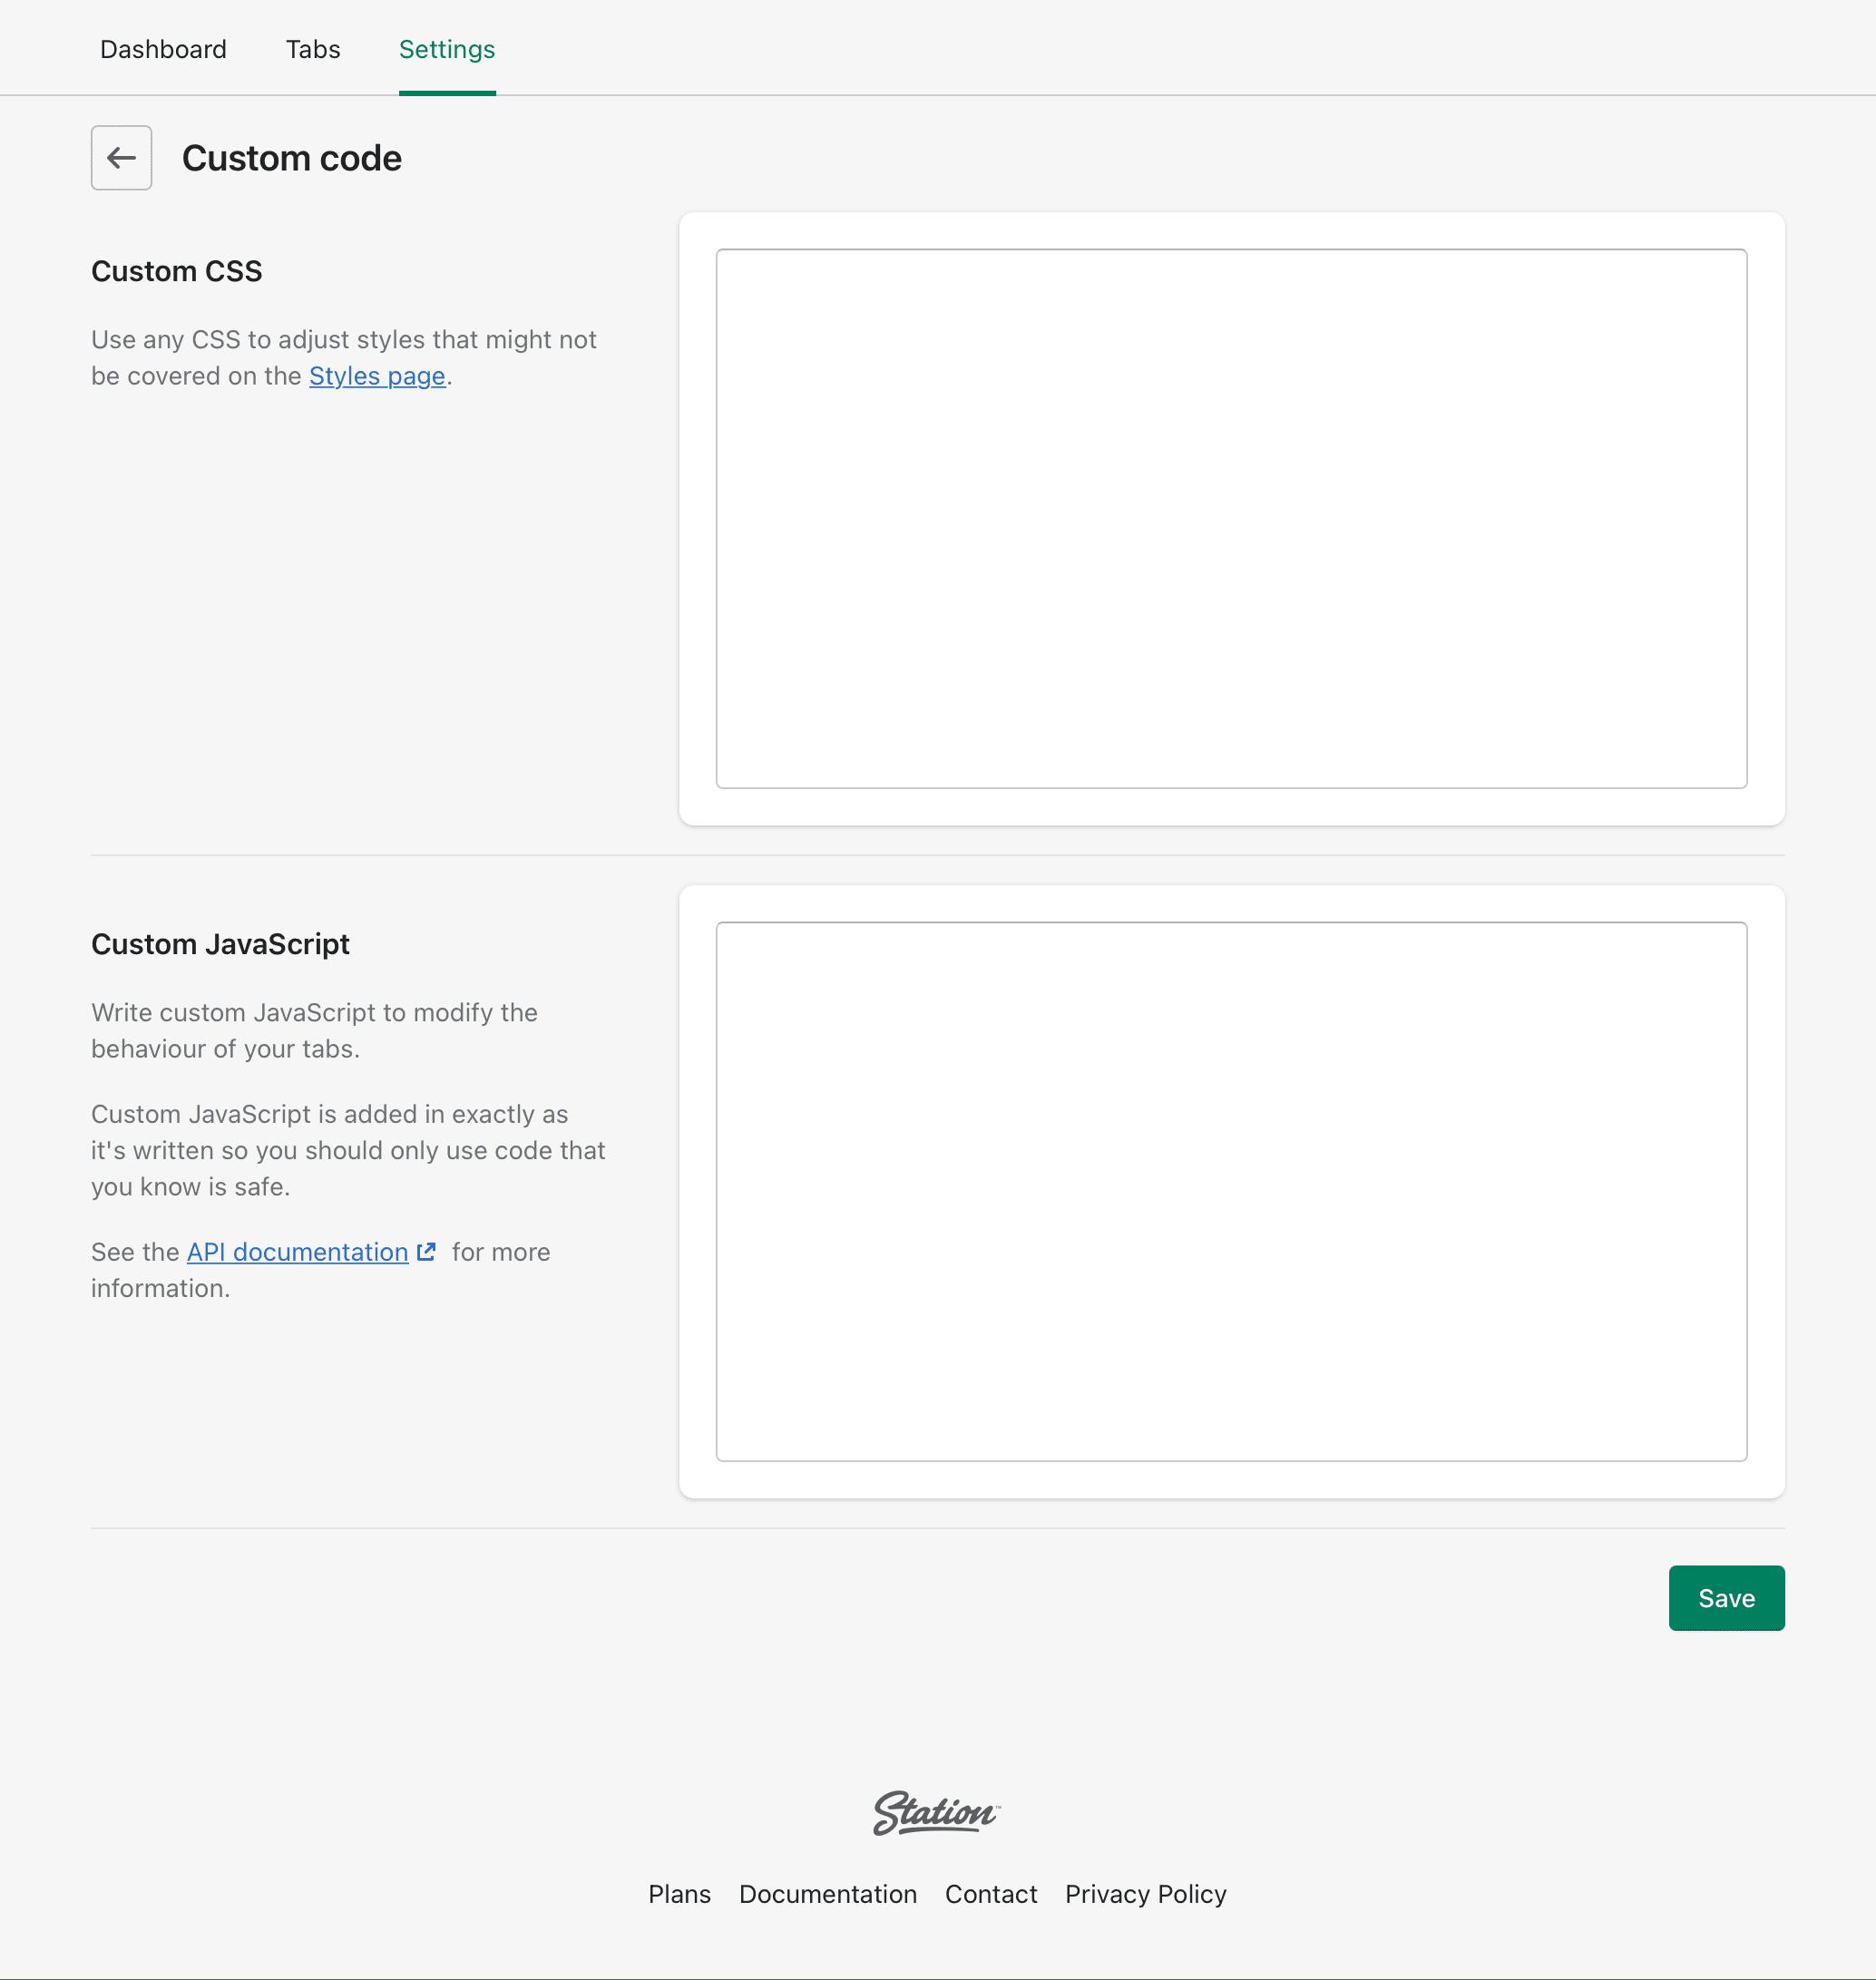 The 'Custom code' settings page